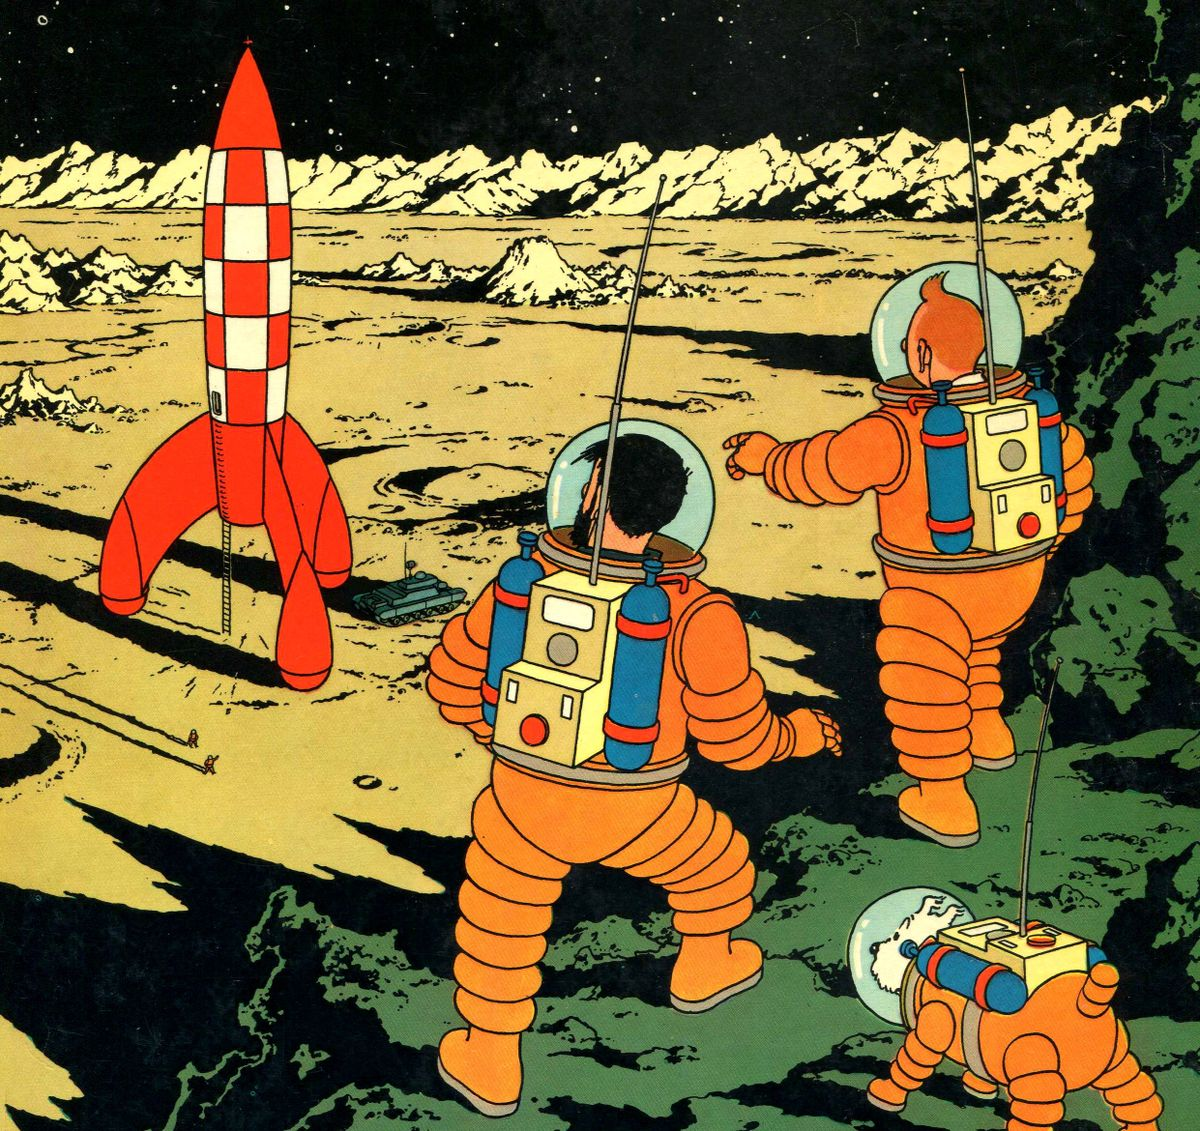 fusee de tintin sur la lune